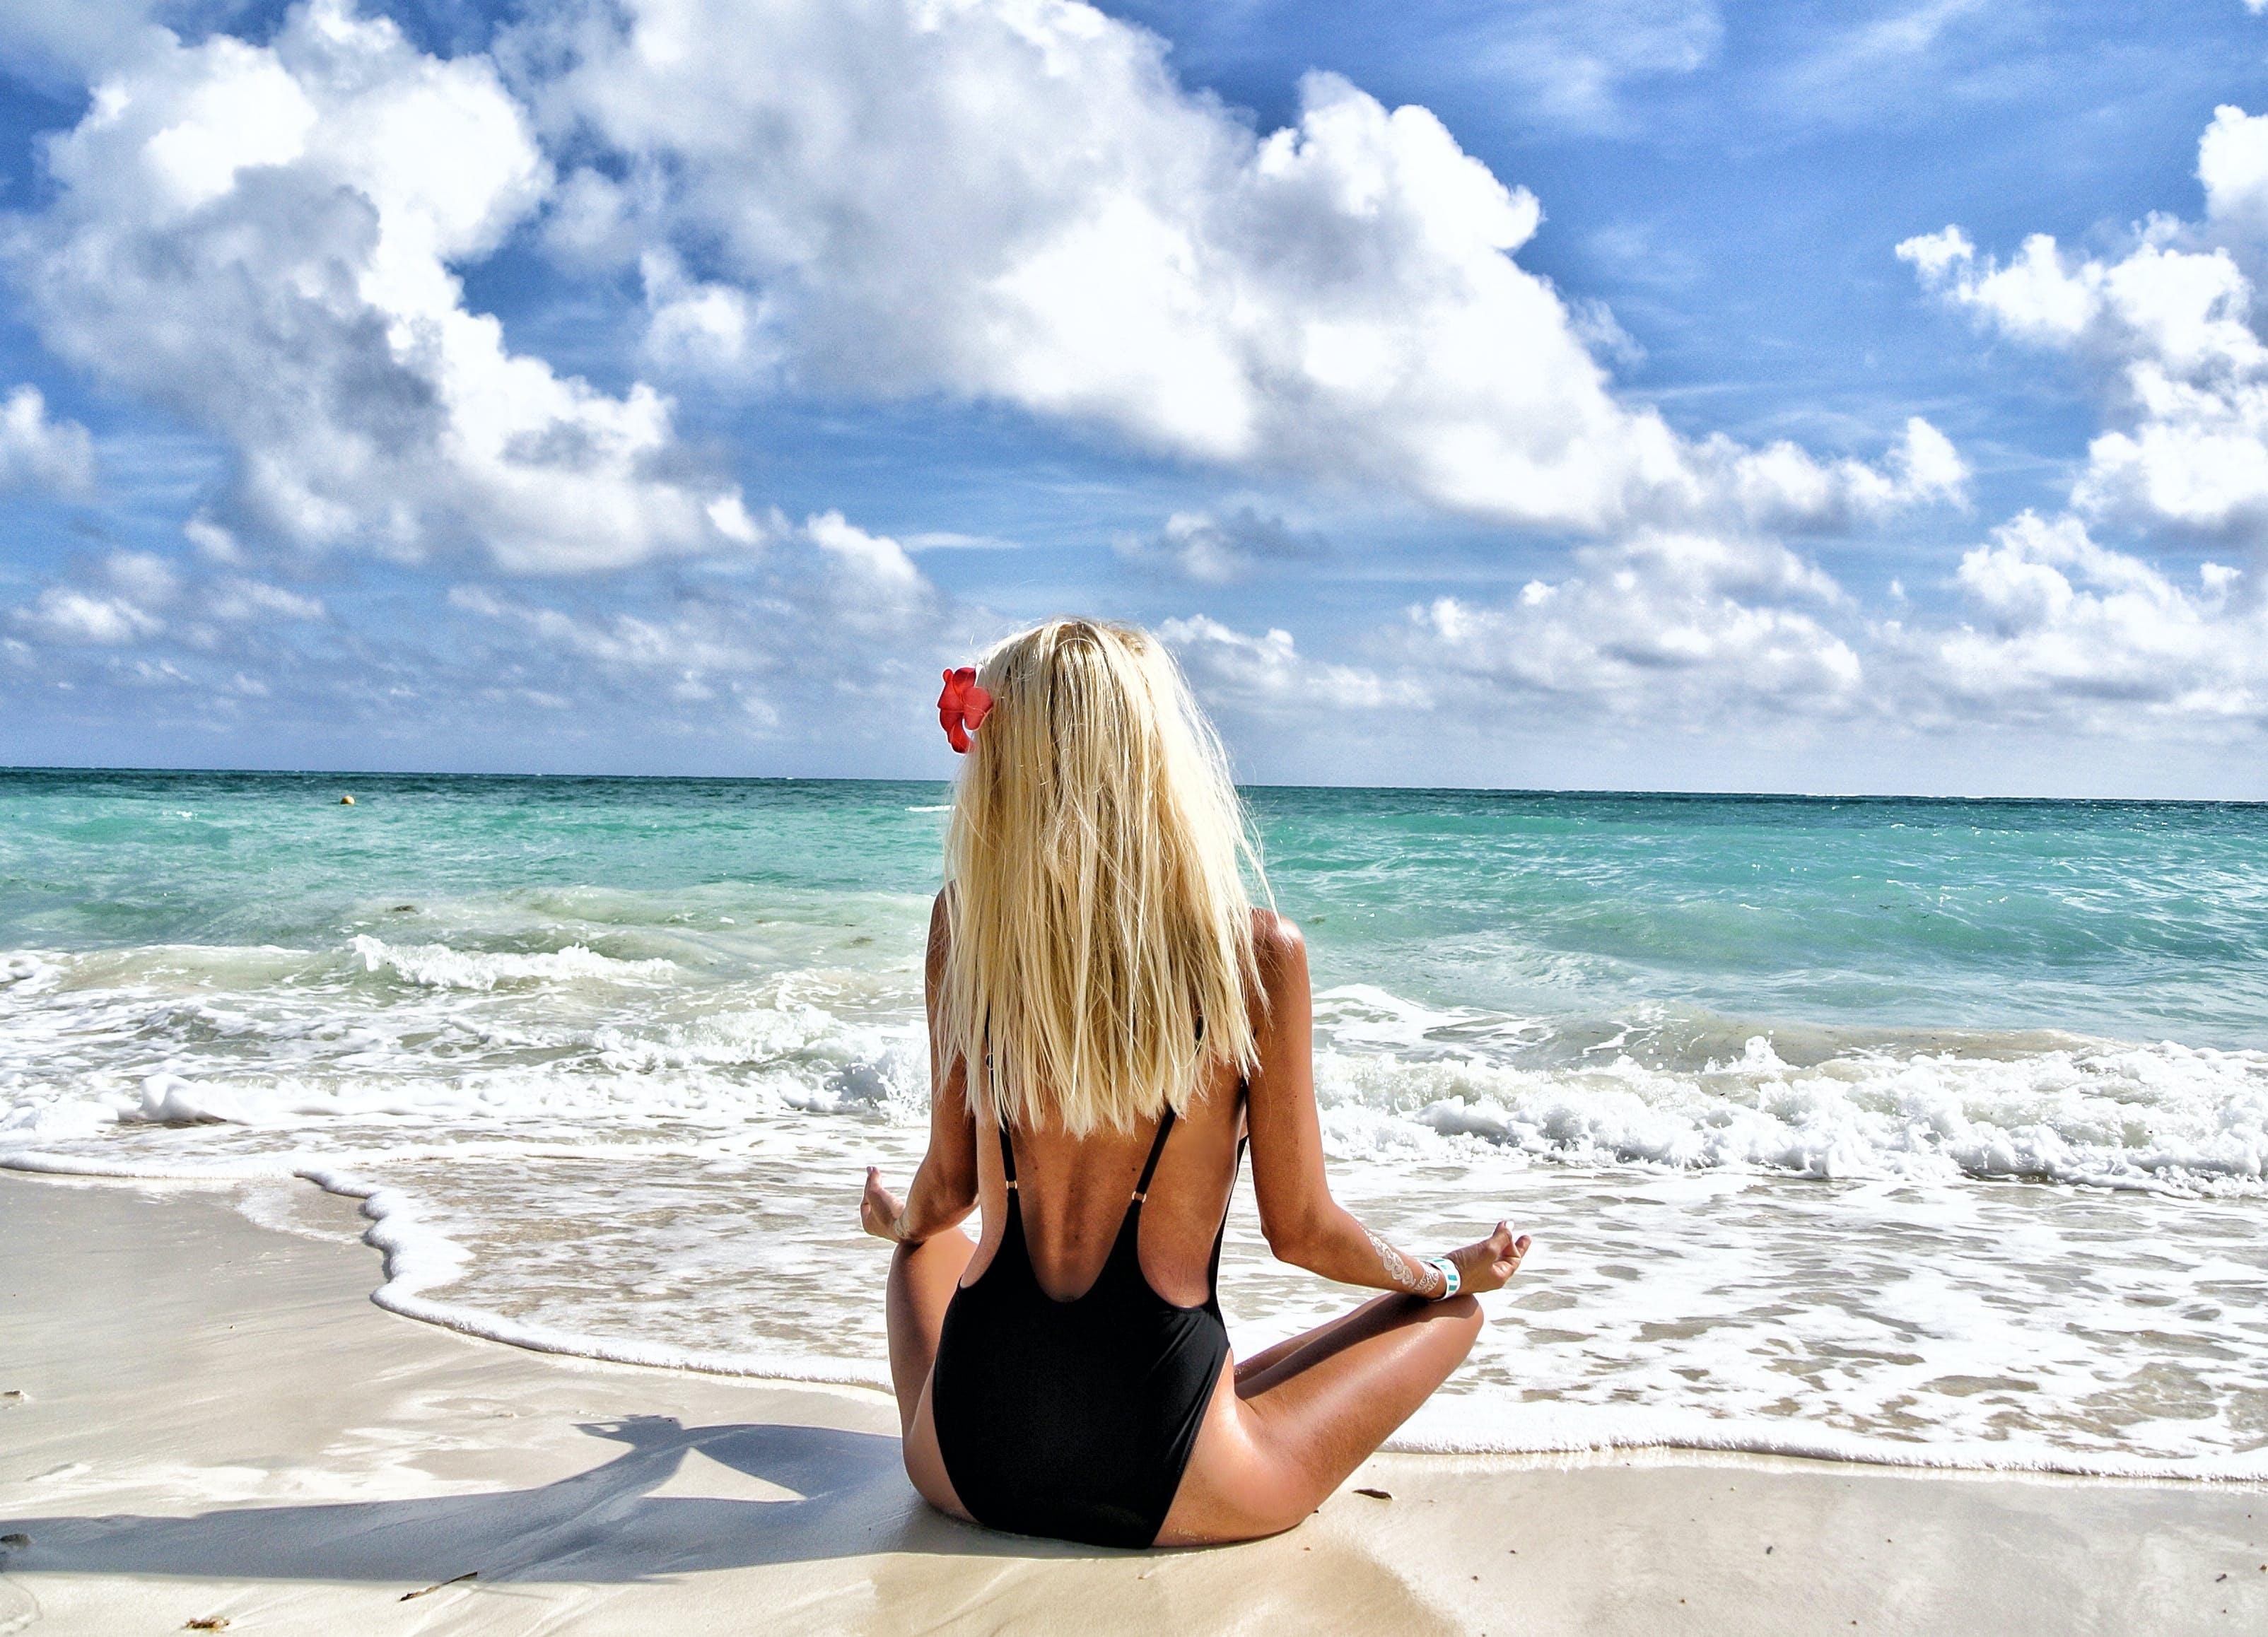 Kostenloses Stock Foto zu meer, himmel, person, strand